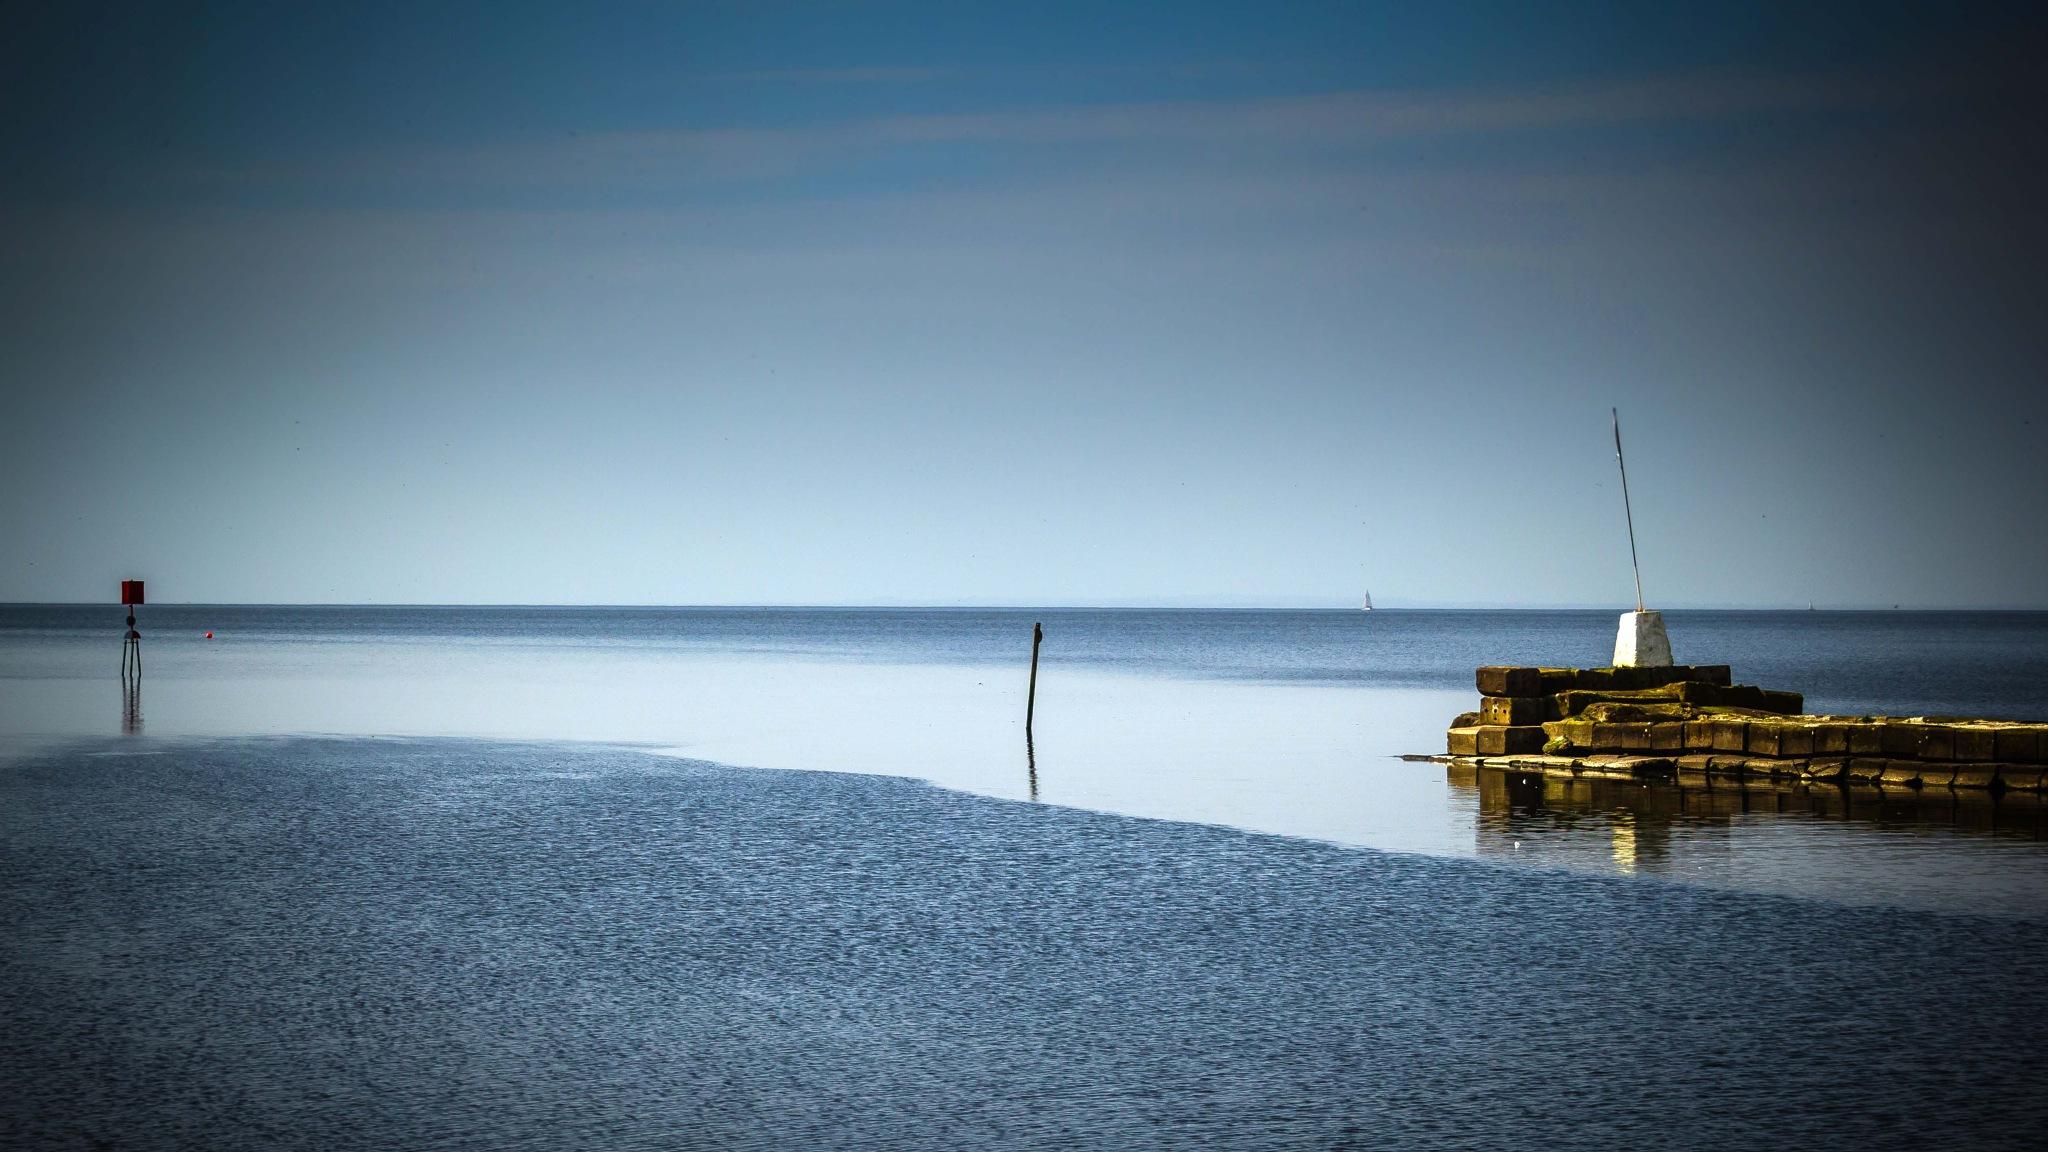 Lough Neagh. by billymcwilliams